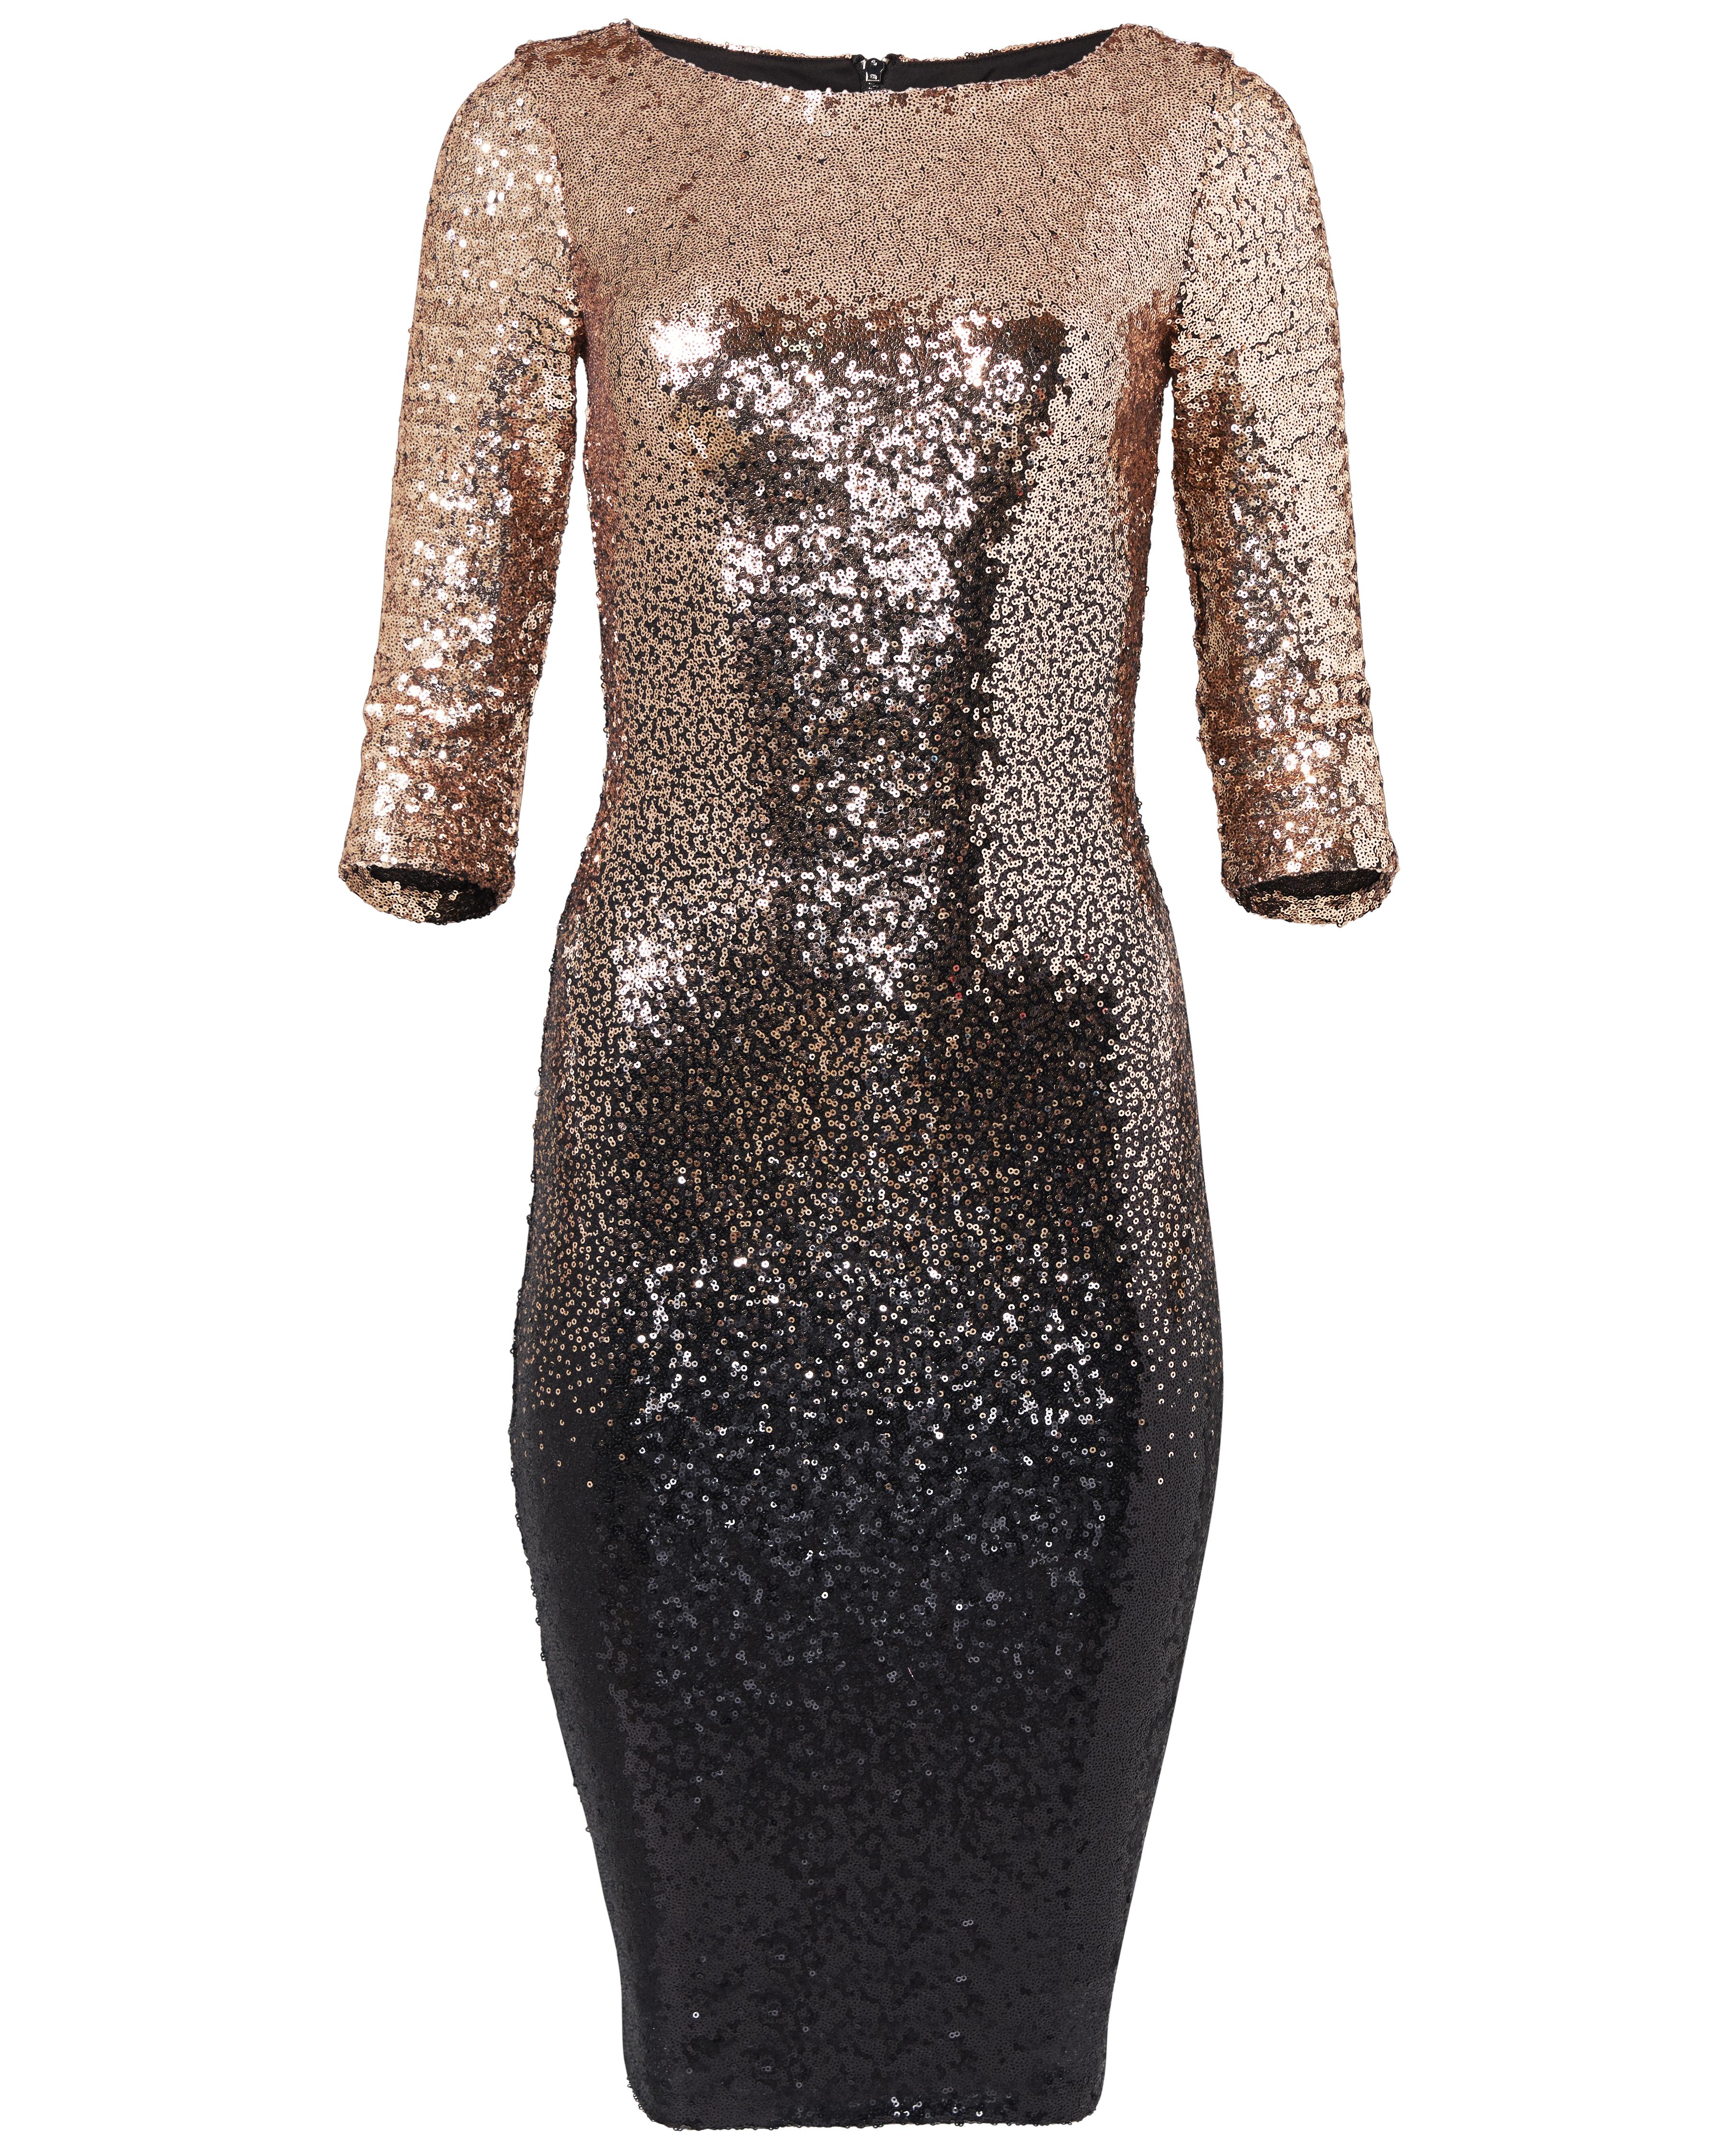 Venus-ombre-sequin-dress